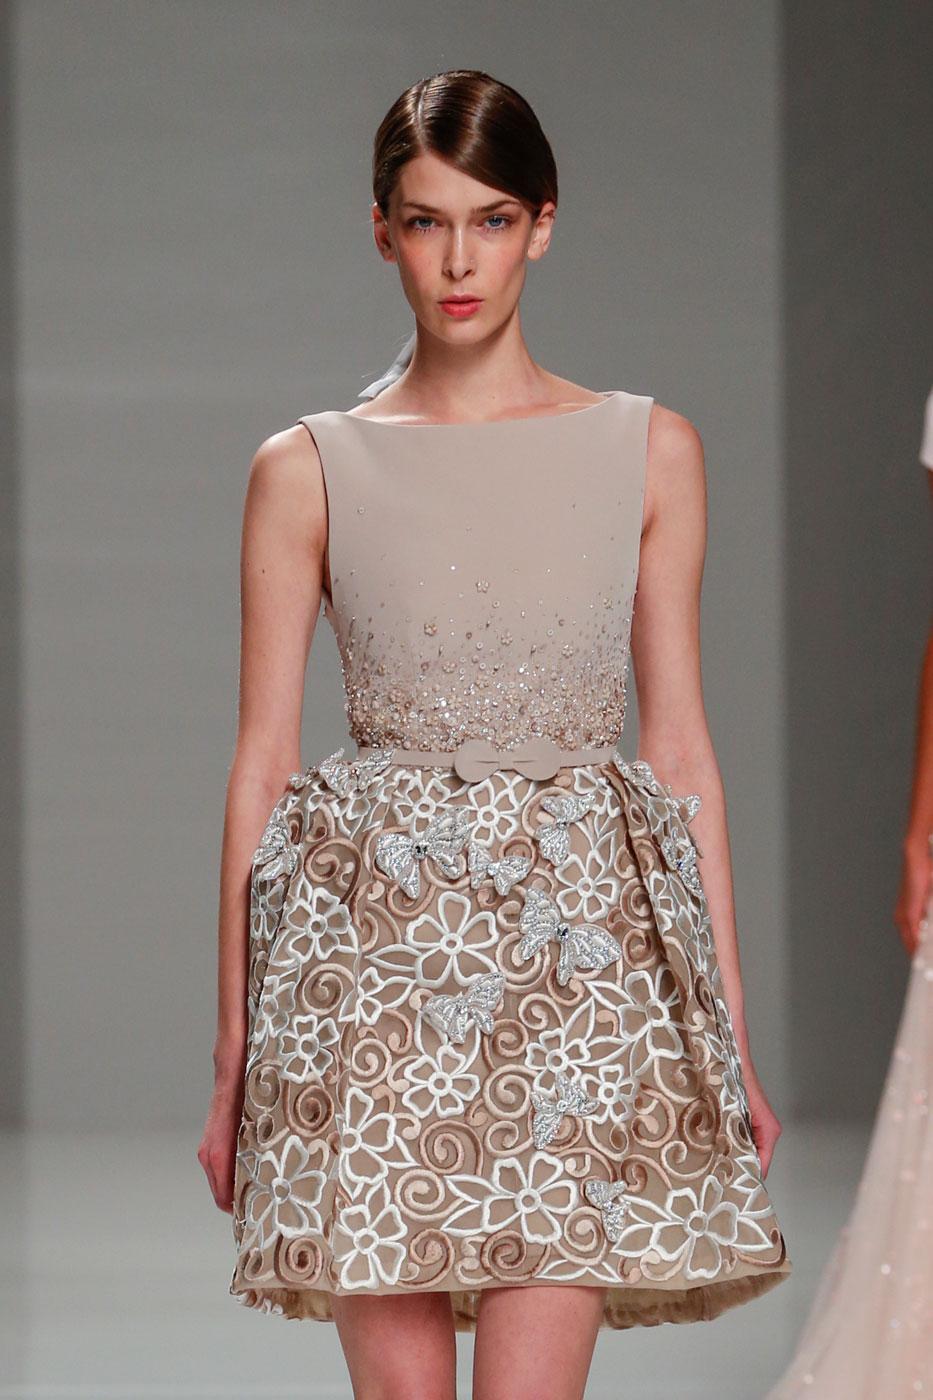 Georges-Hobeika-fashion-runway-show-haute-couture-paris-spring-2015-the-impression-54